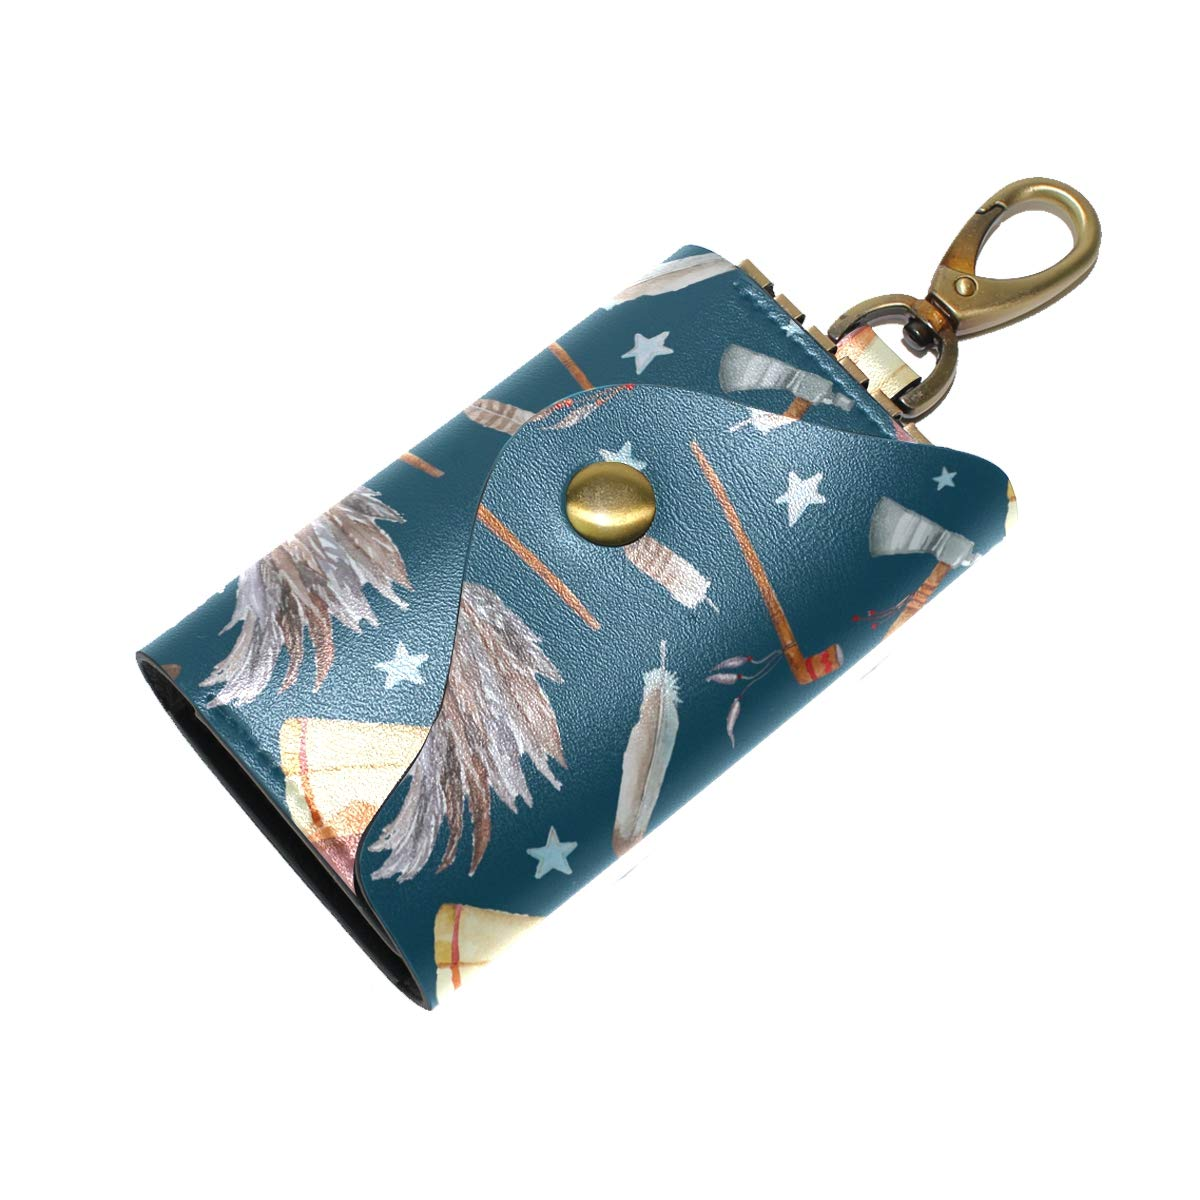 KEAKIA Watercolor Tribal Pattern Leather Key Case Wallets Tri-fold Key Holder Keychains with 6 Hooks 2 Slot Snap Closure for Men Women